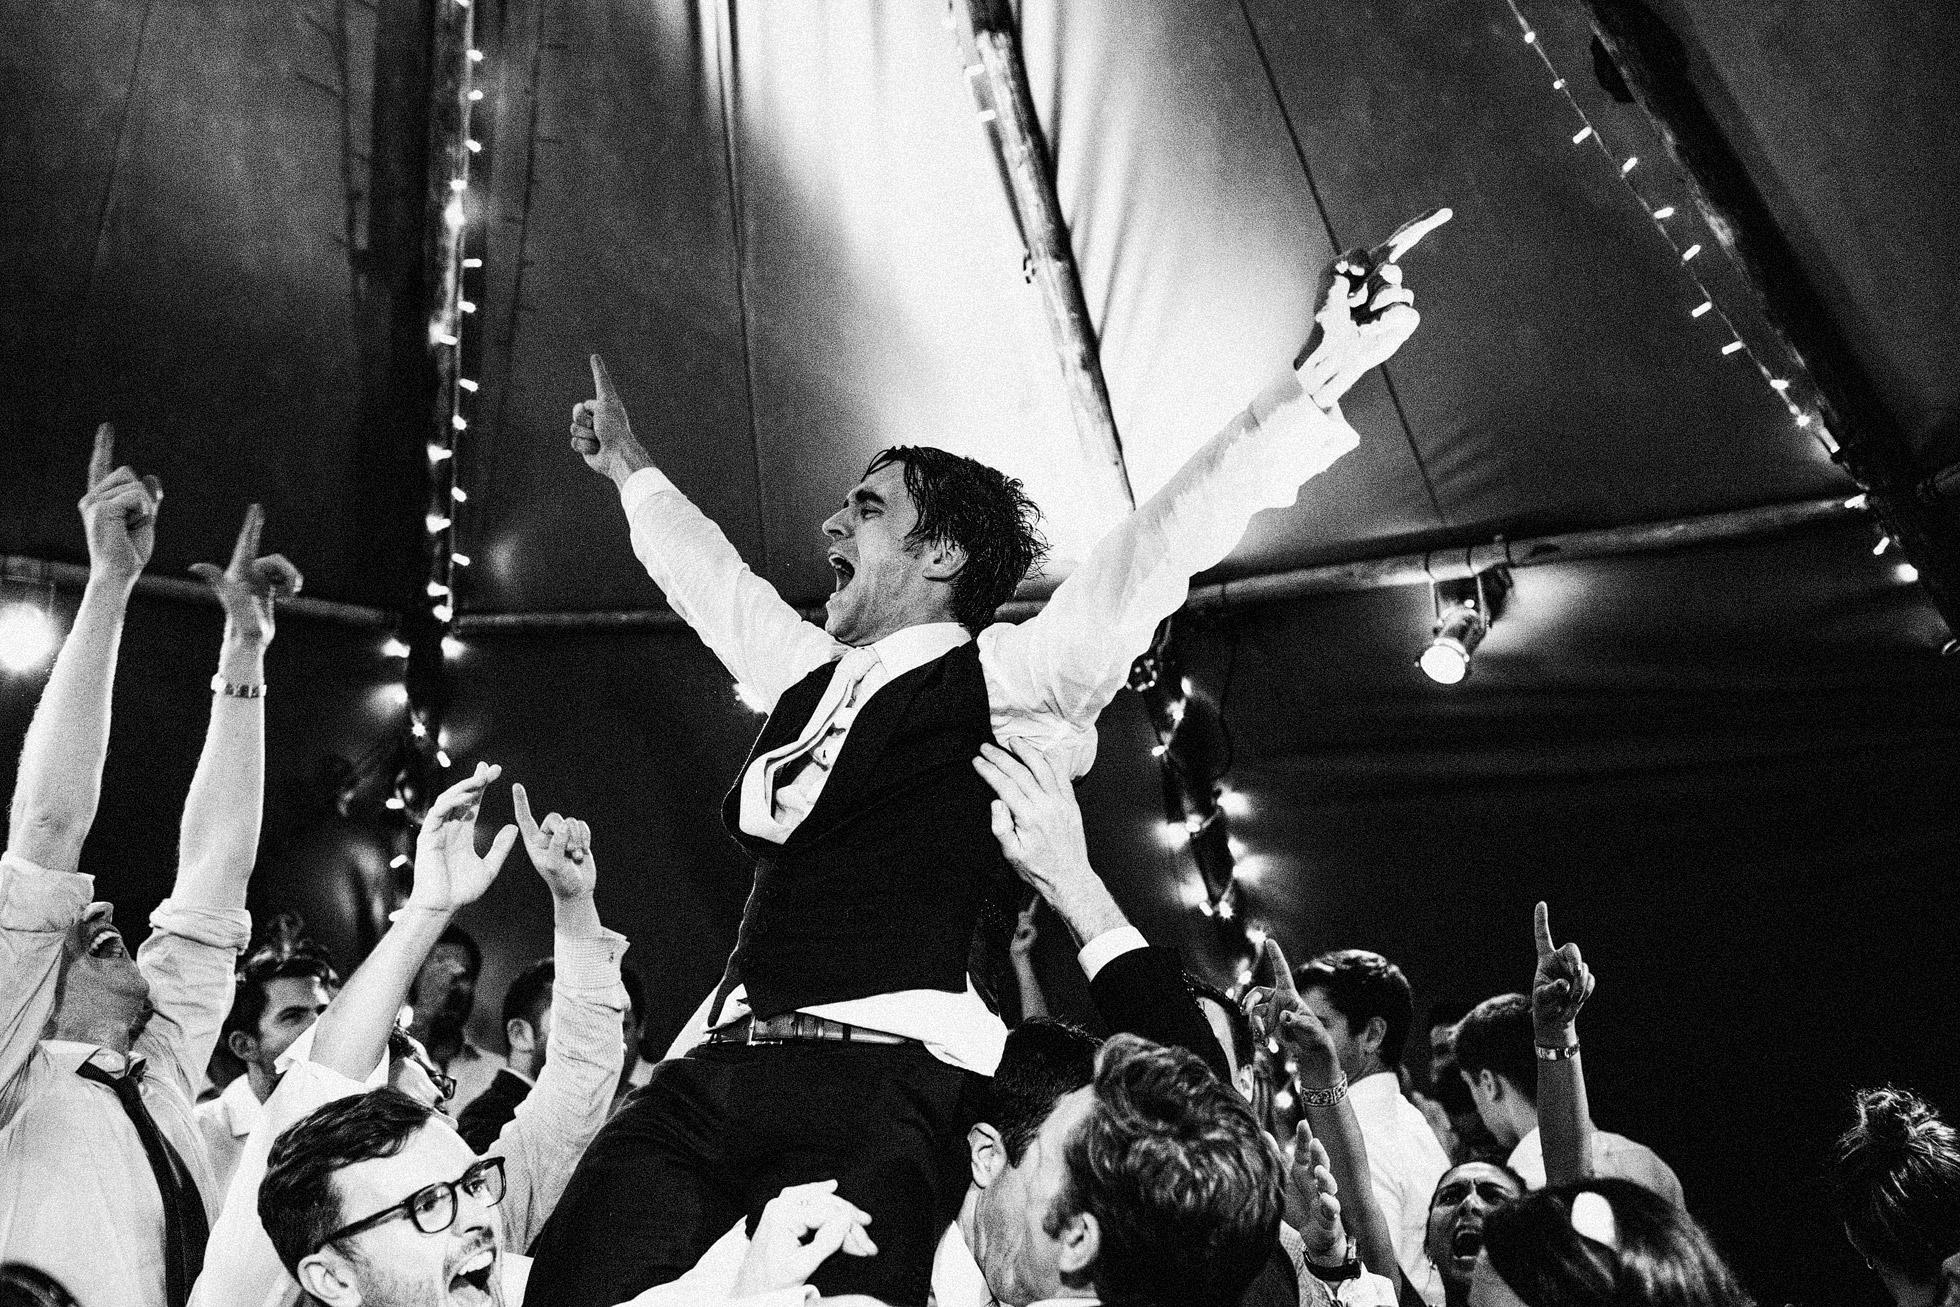 Black and White Dancefloor Madness